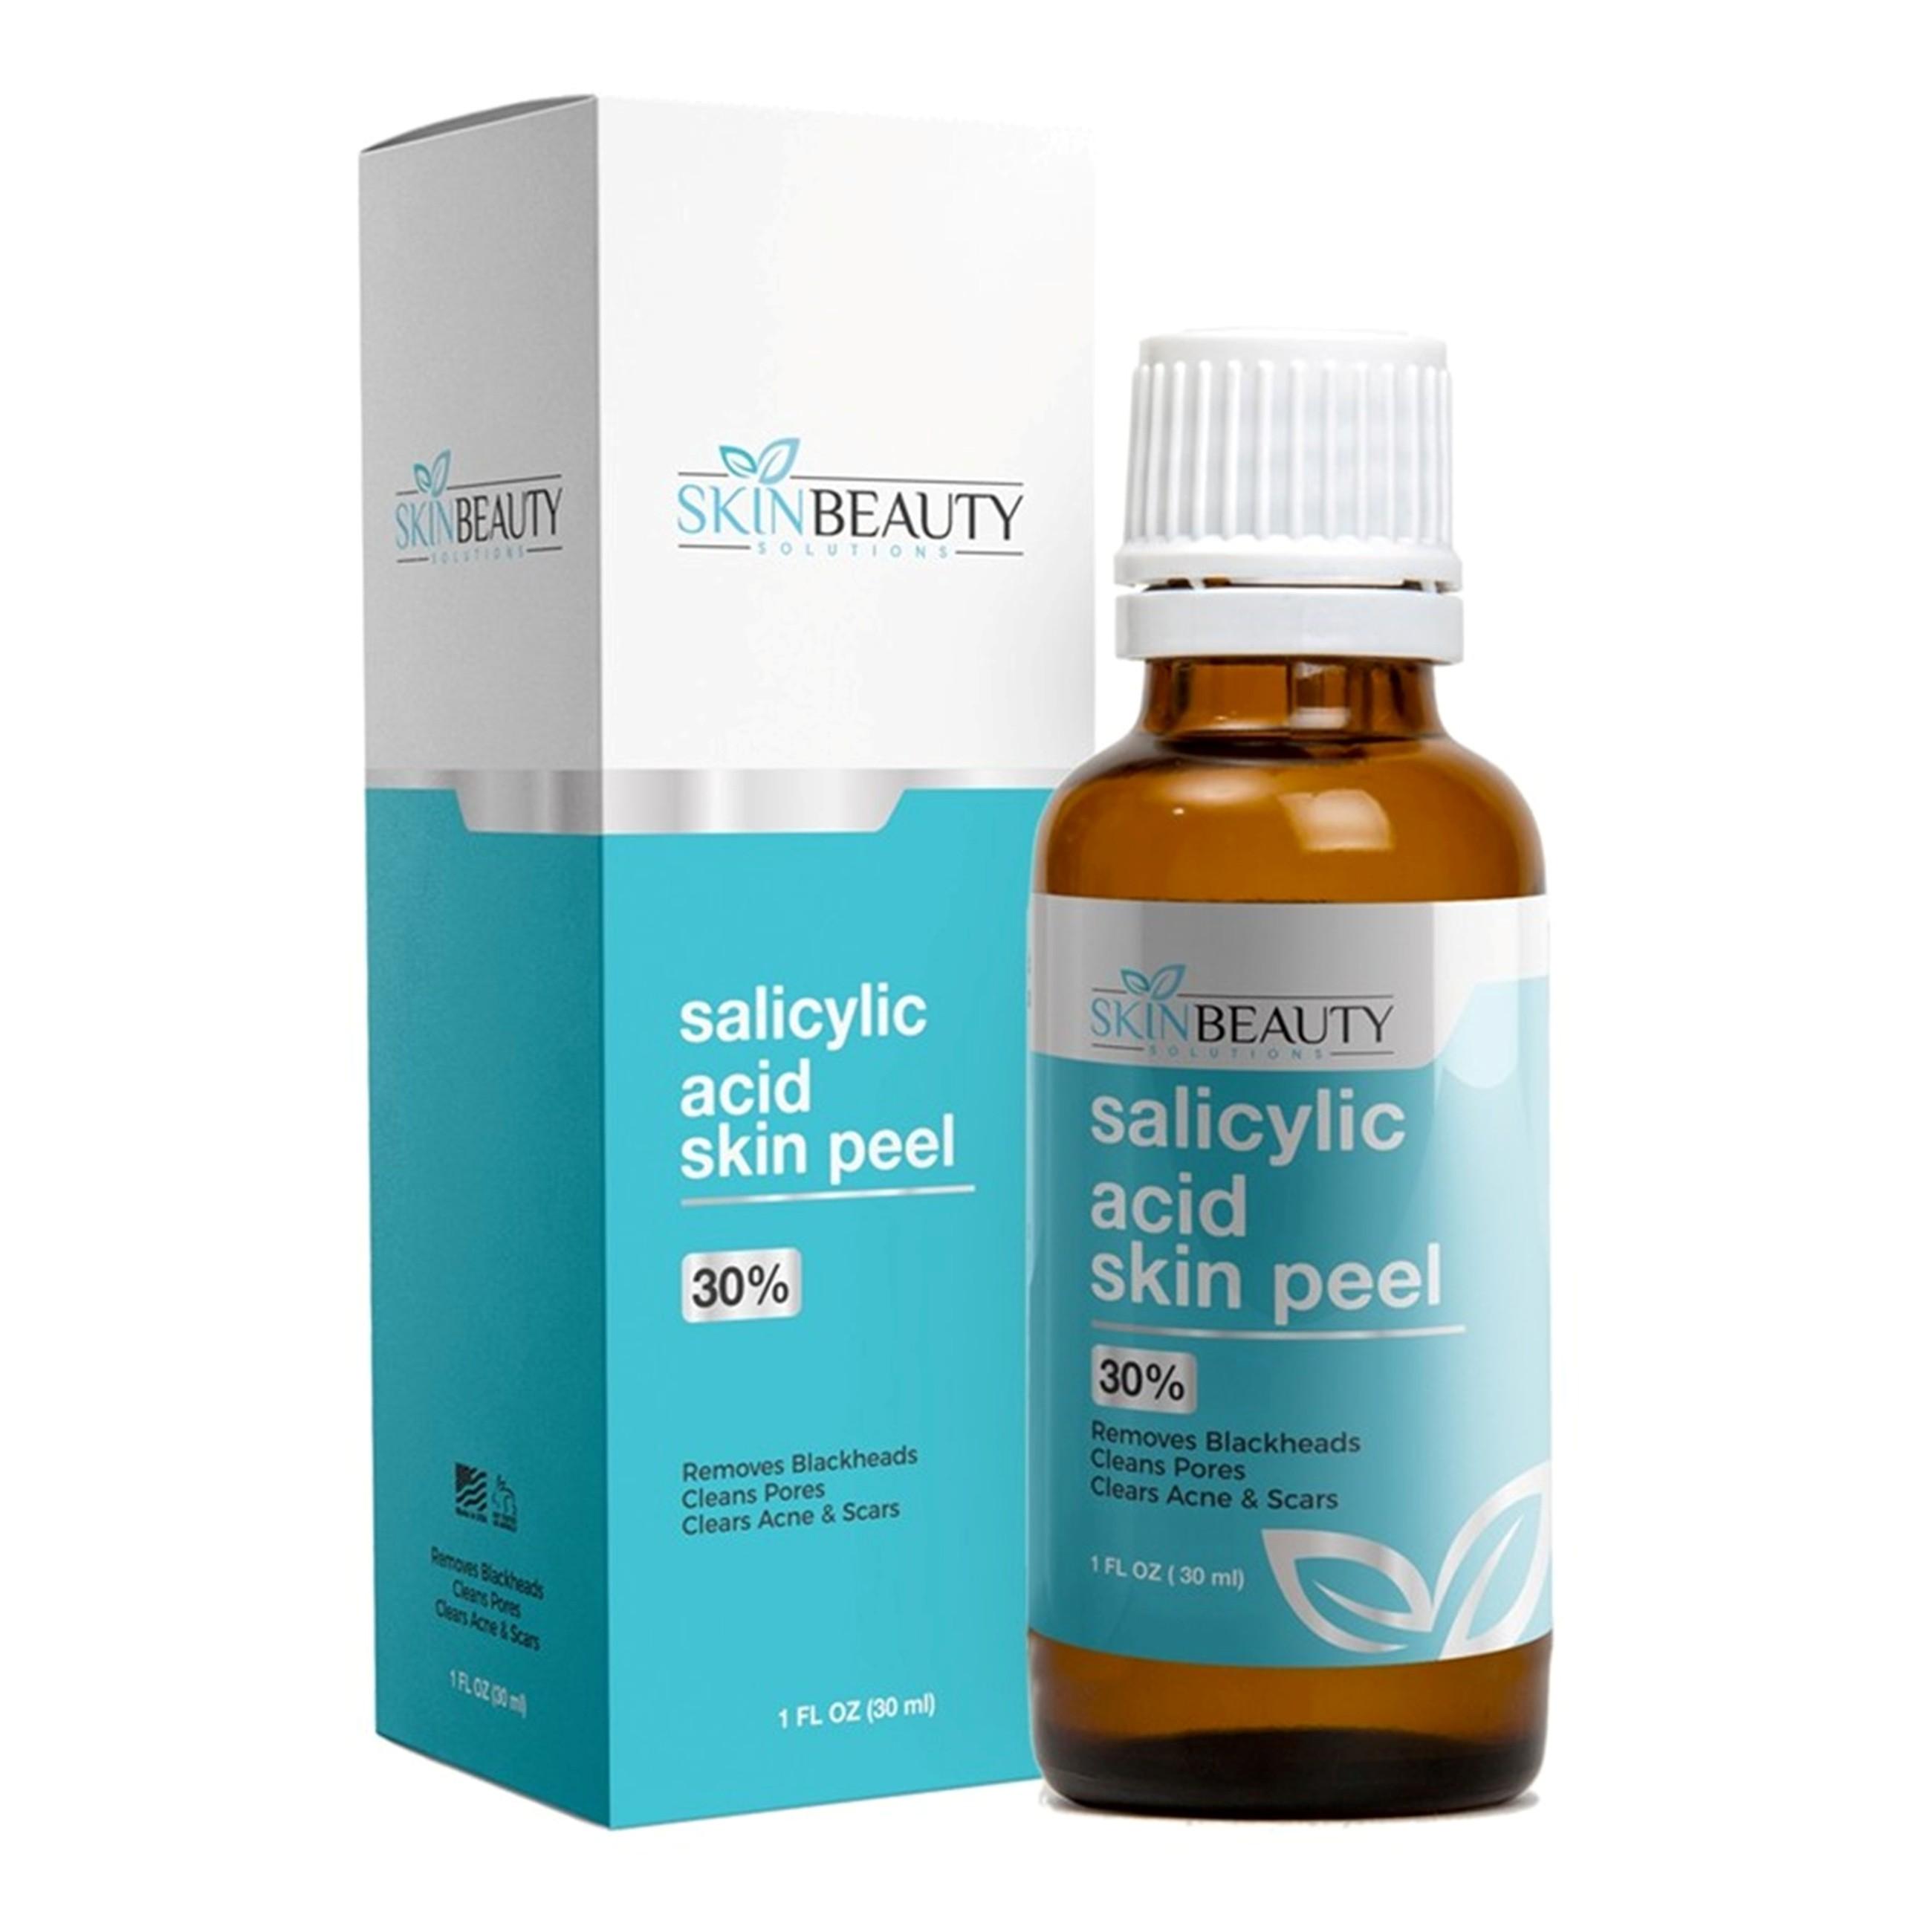 SALICYLIC ACID Skin Chemical Peel 30% | Natural Beta Hydroxy Acid (BHA) For  Oily Skin | Treats Acne, Clogged Pores, Blackheads, Seborrheic Keratosis,